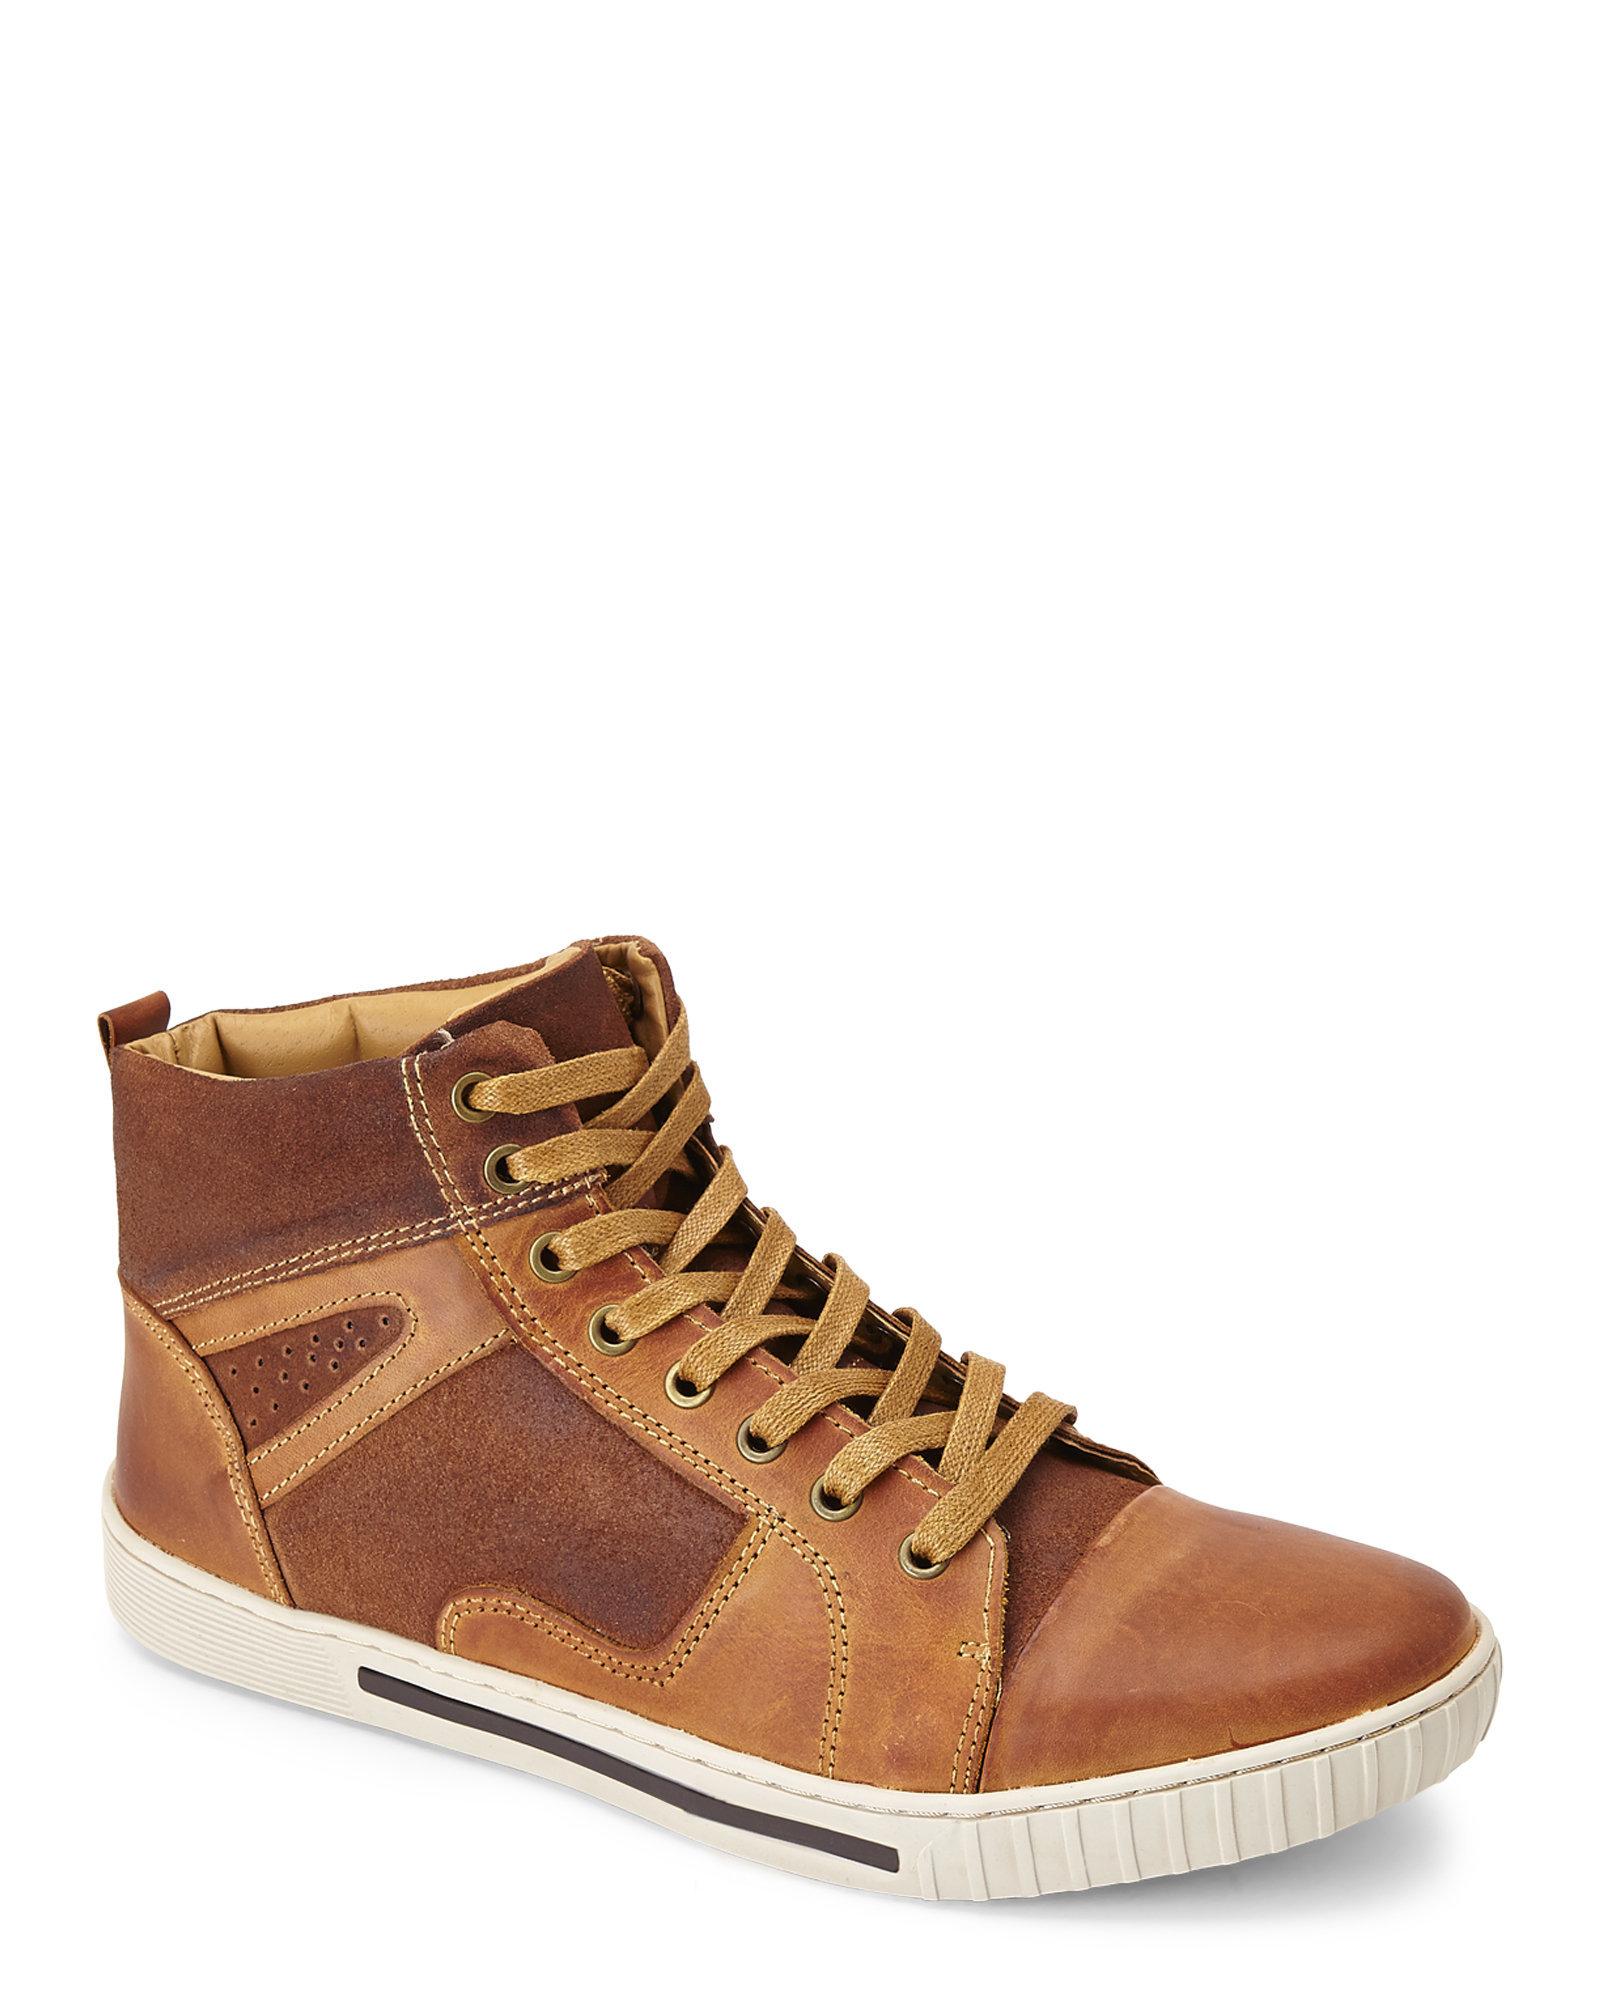 Steve Madden High Top Sneakers